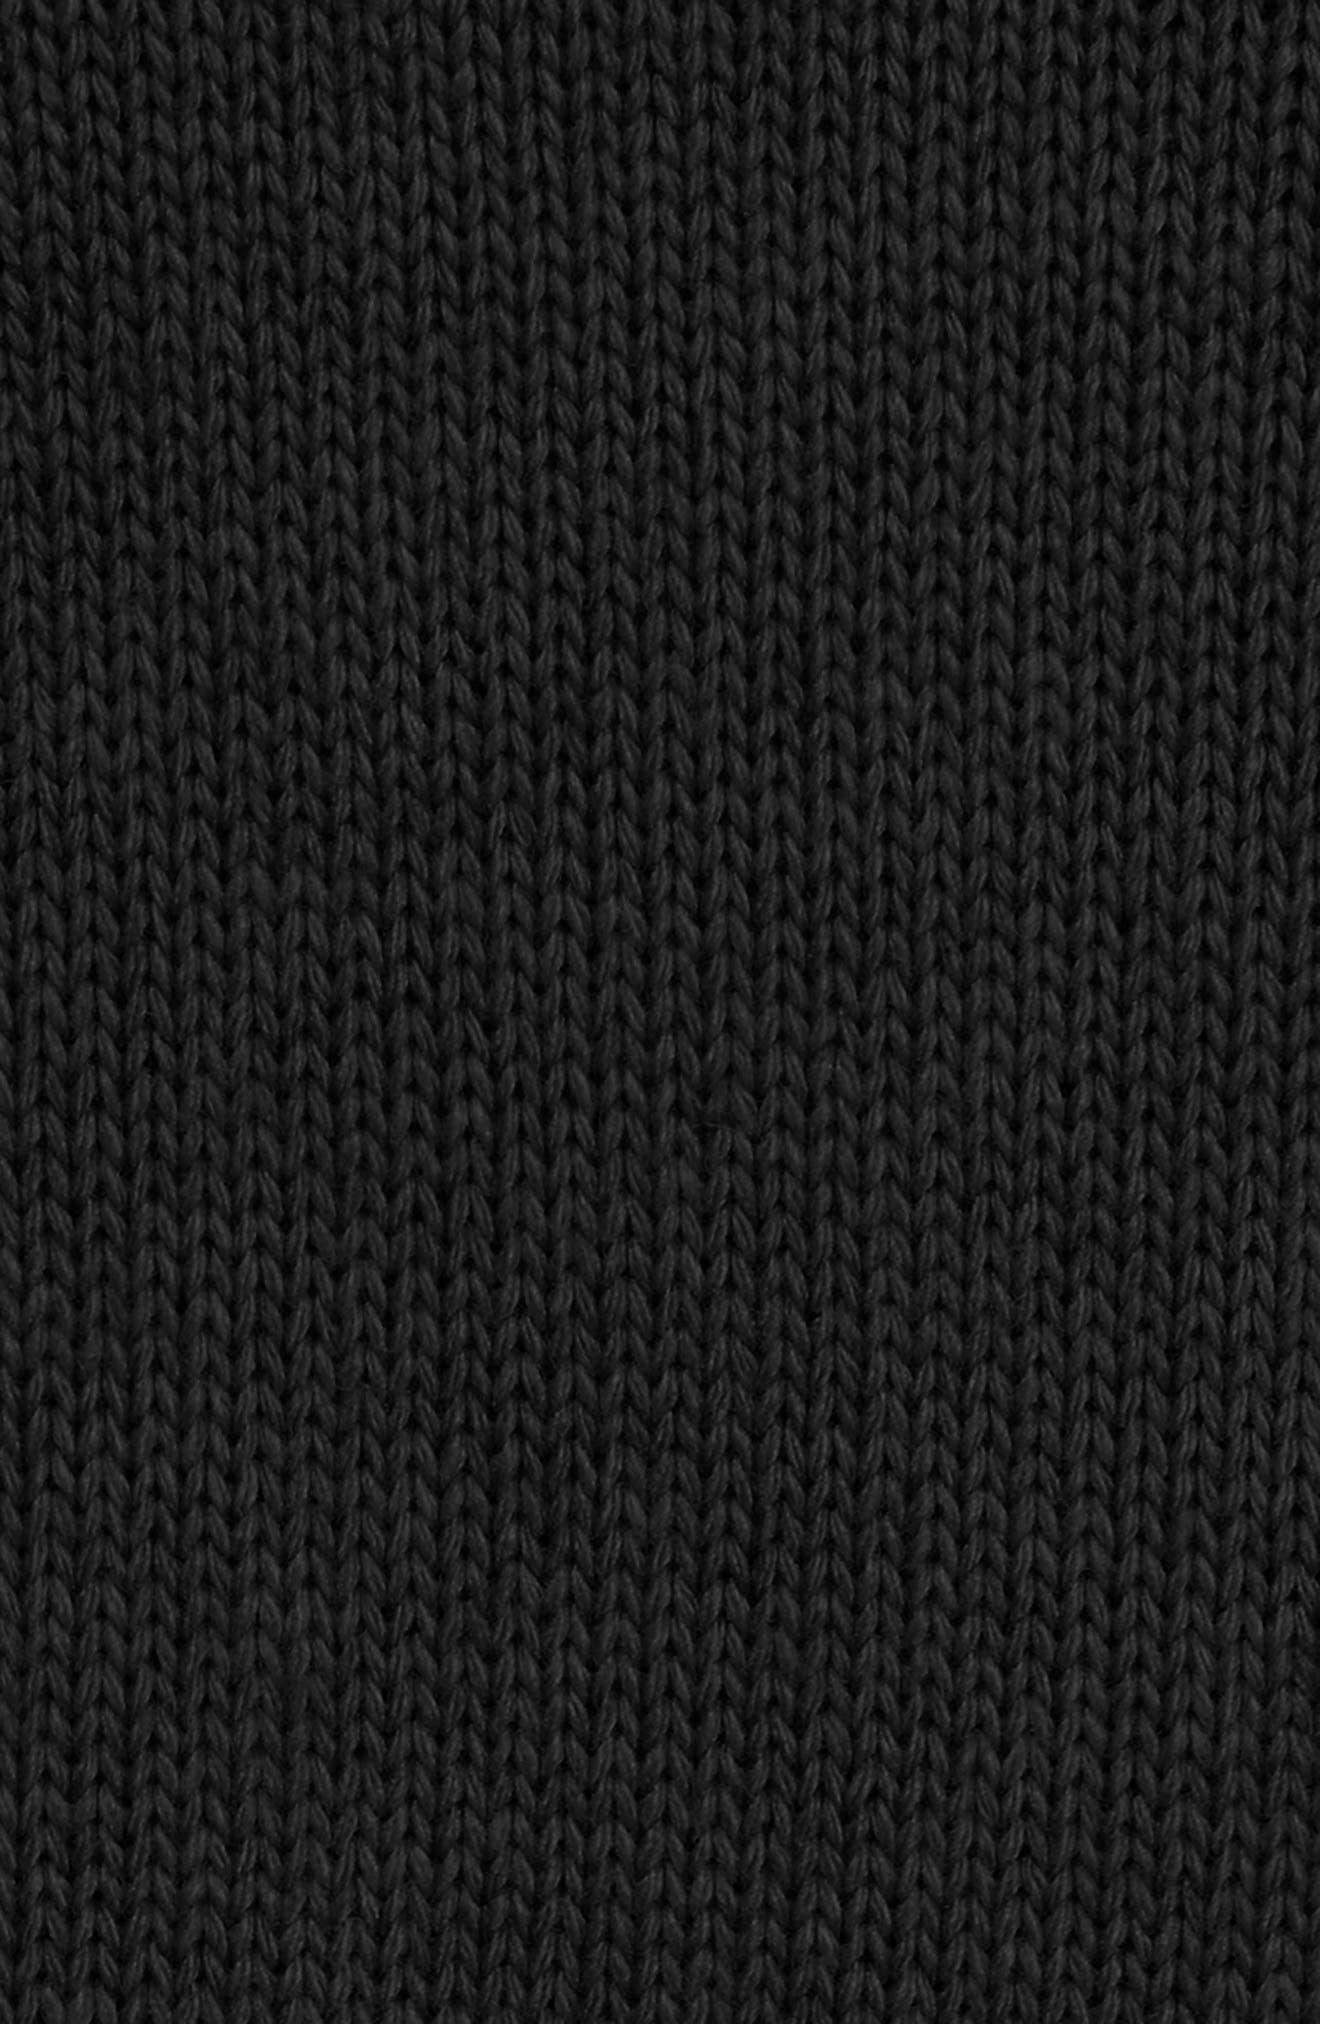 Remi Layered Pullover,                             Alternate thumbnail 5, color,                             Black/ White